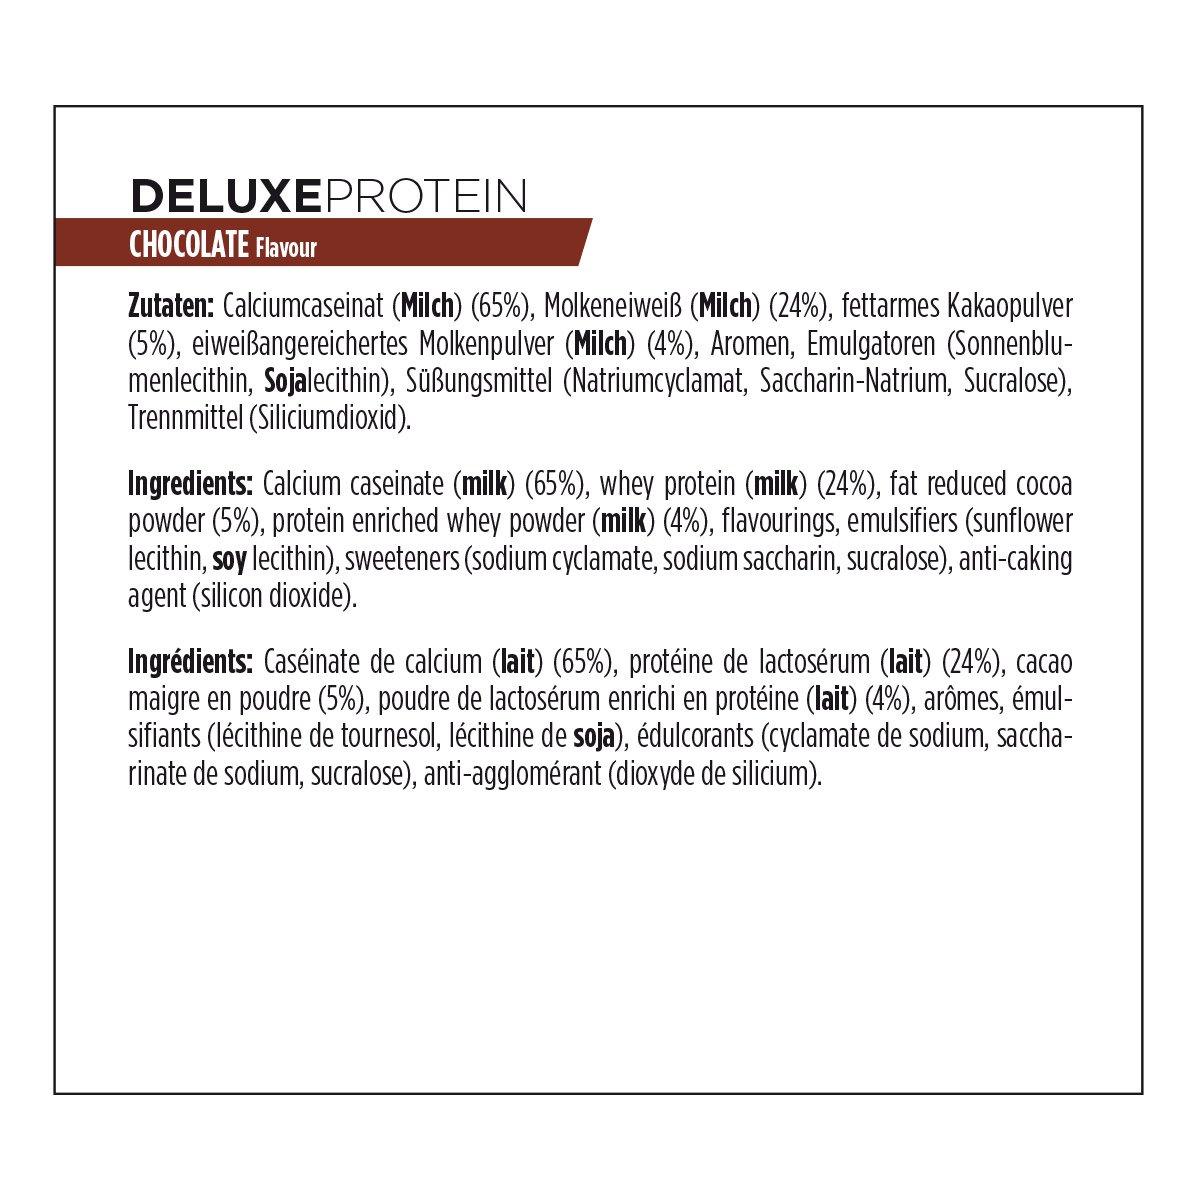 Powerbar Deluxe Protein Chocolate Proteína en Polvo con Caseína y Proteína de Suero de Leche - 500 gr